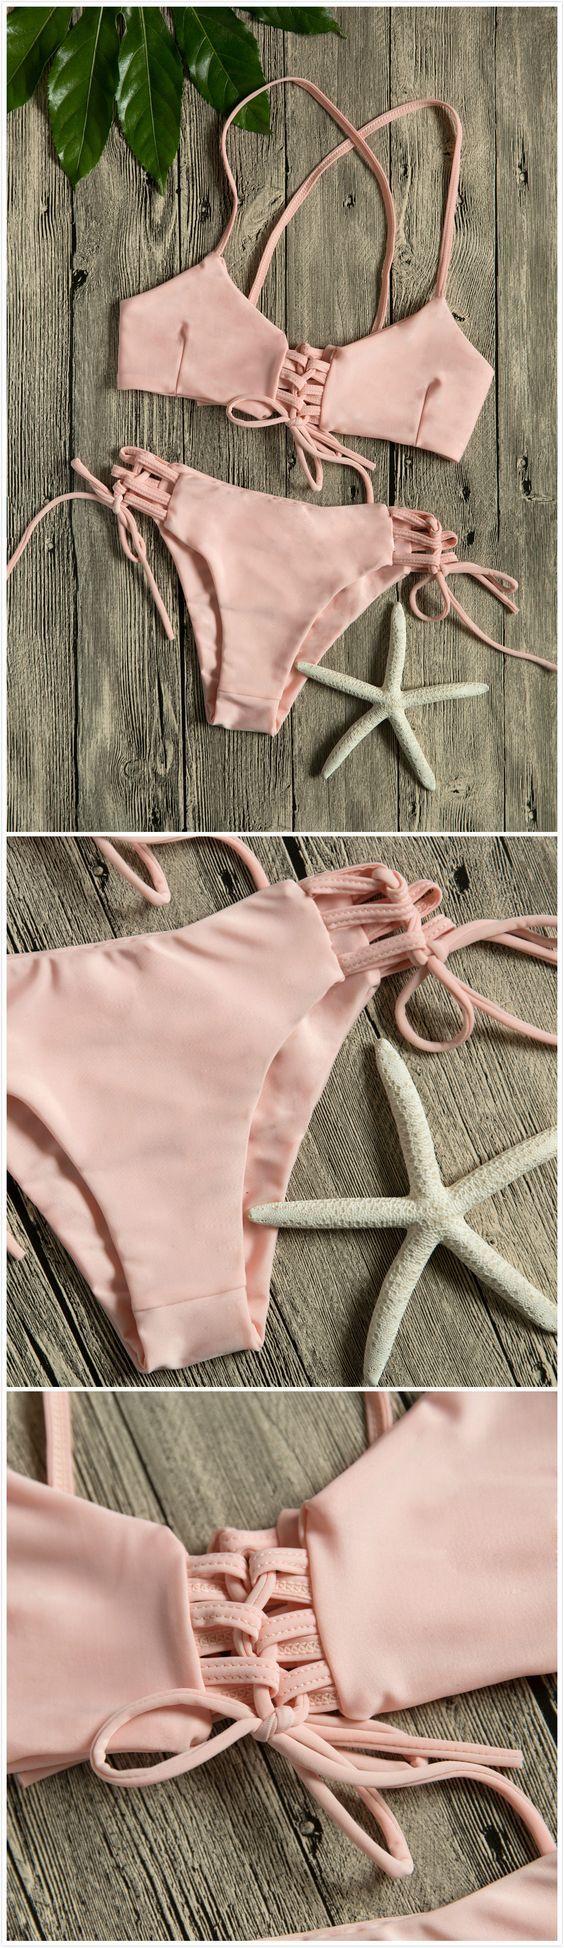 Women Multi-tie Lace-up Two Piece Swimsuit Bikini